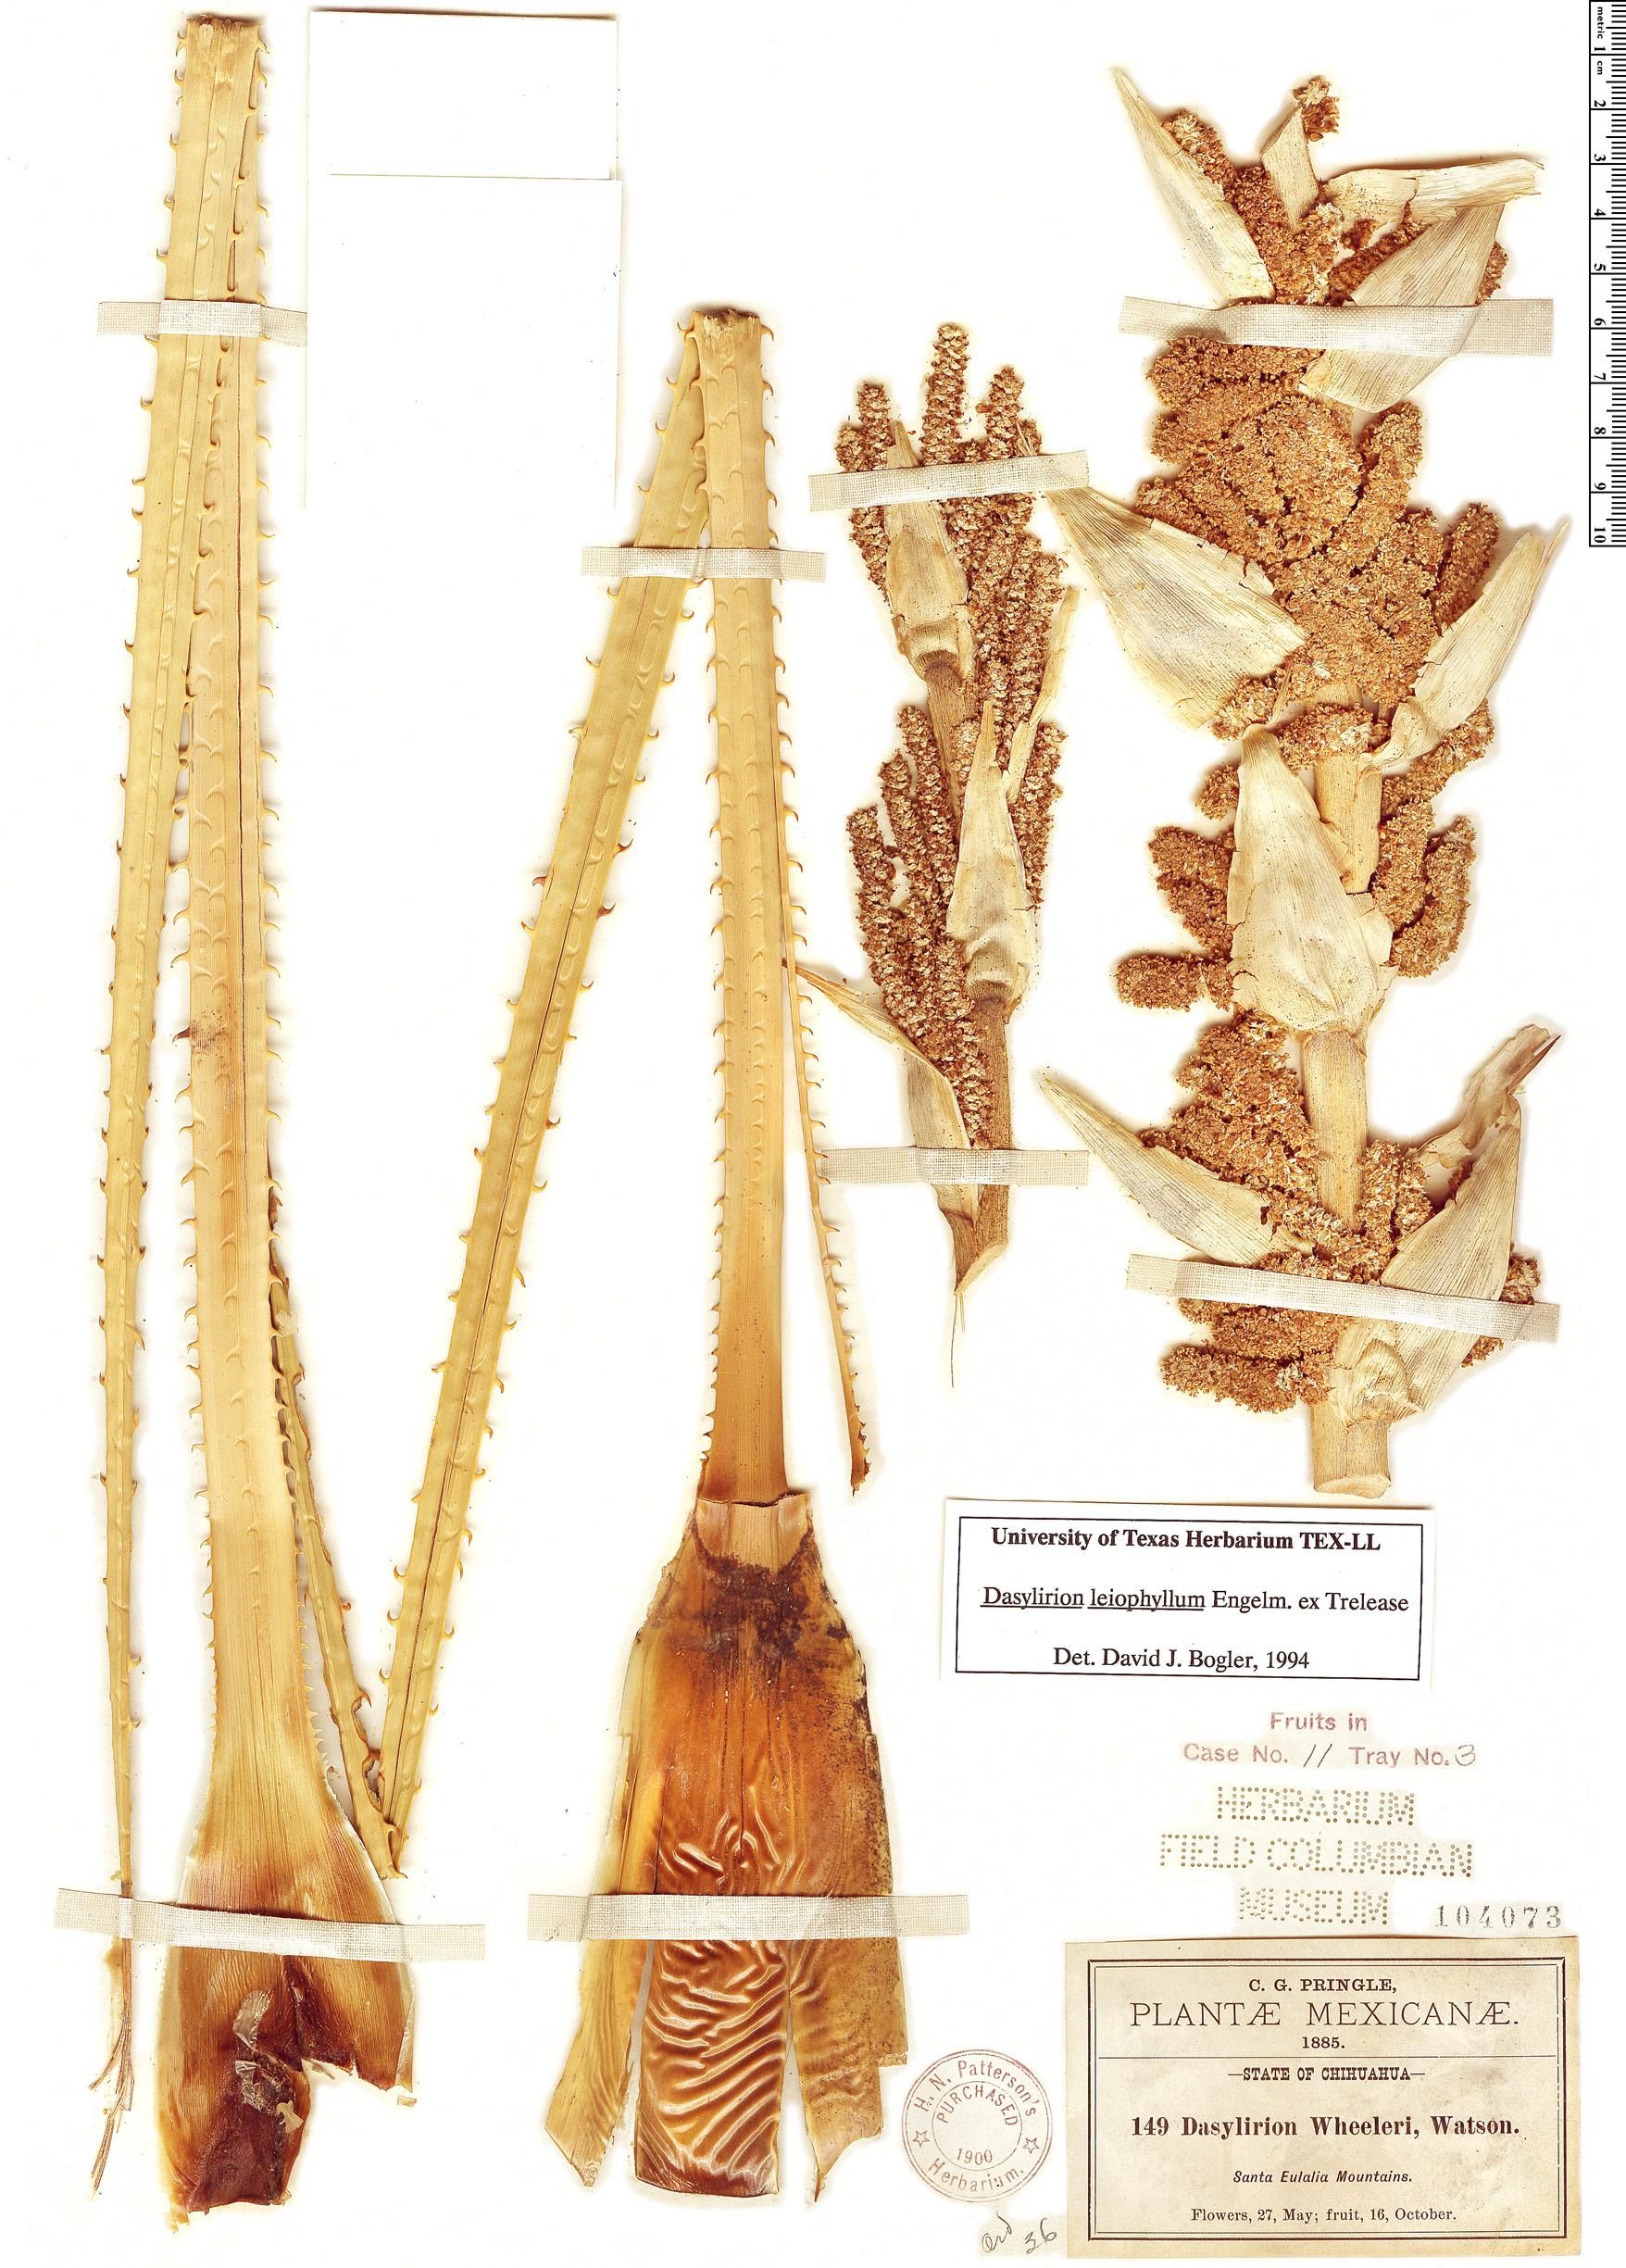 Specimen: Dasylirion leiophyllum